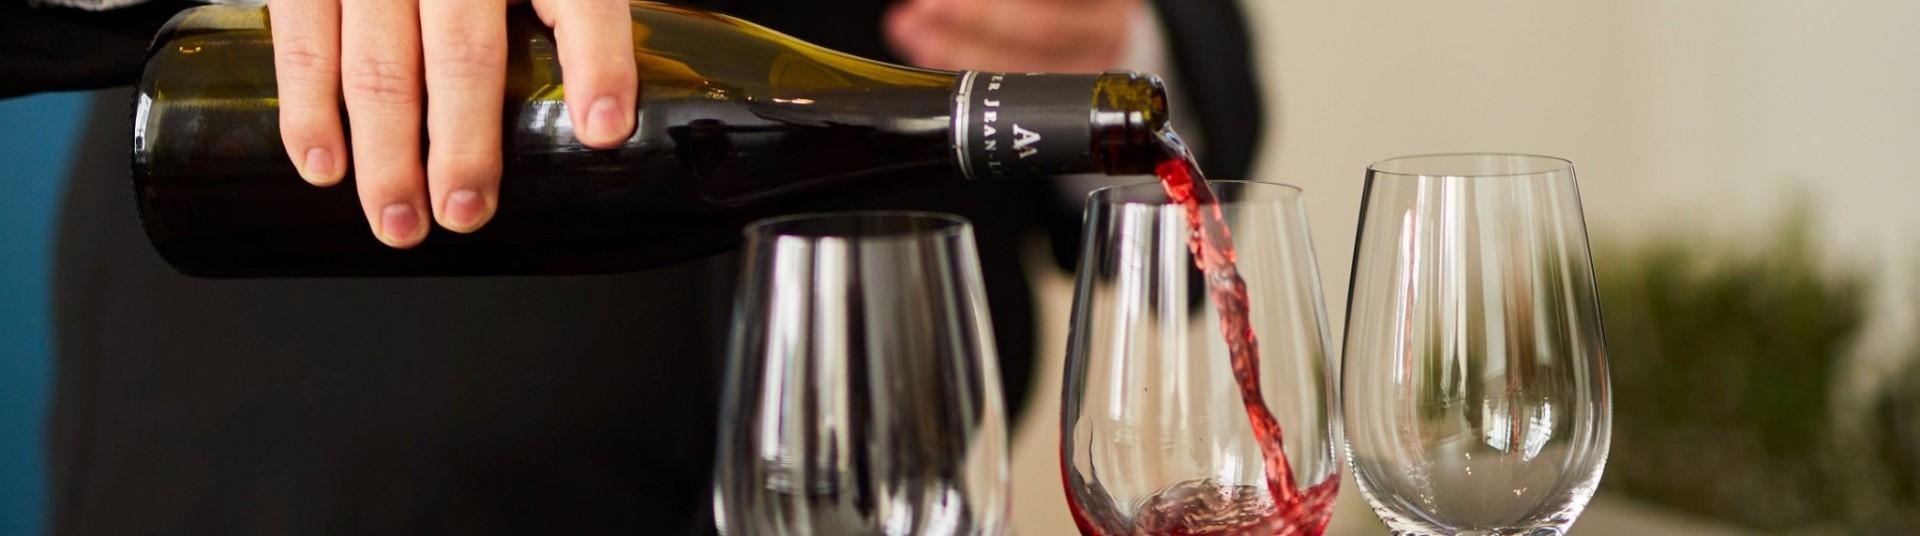 wine-school-by-fabrice-sommier-oenologie-vins-macon-beaujolais